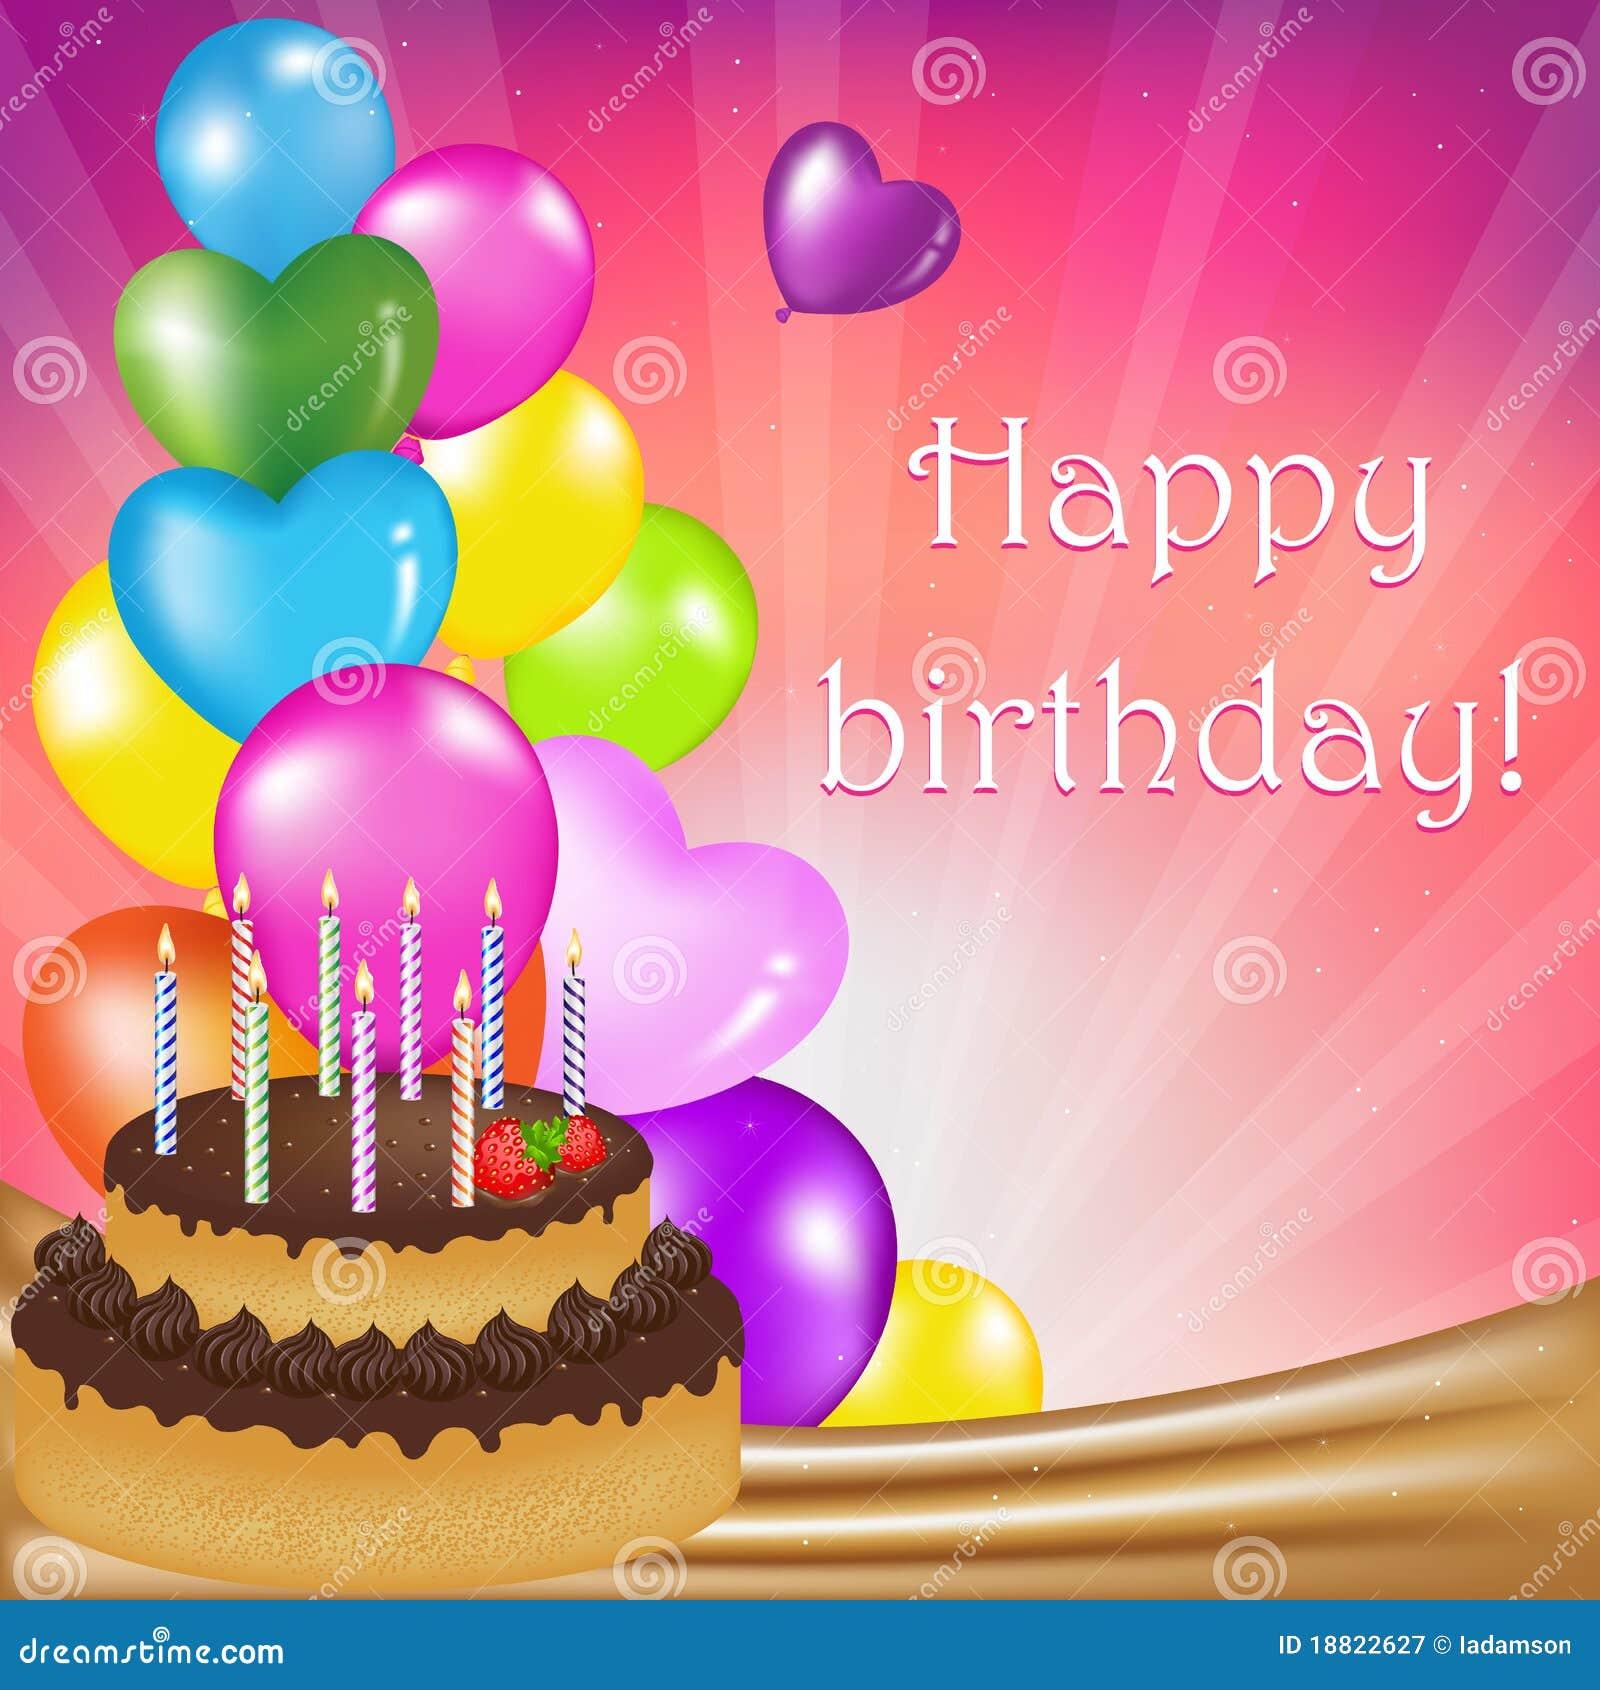 Birthday Day Card Royalty Free Photography Image 18822627 – Birthday Day Card